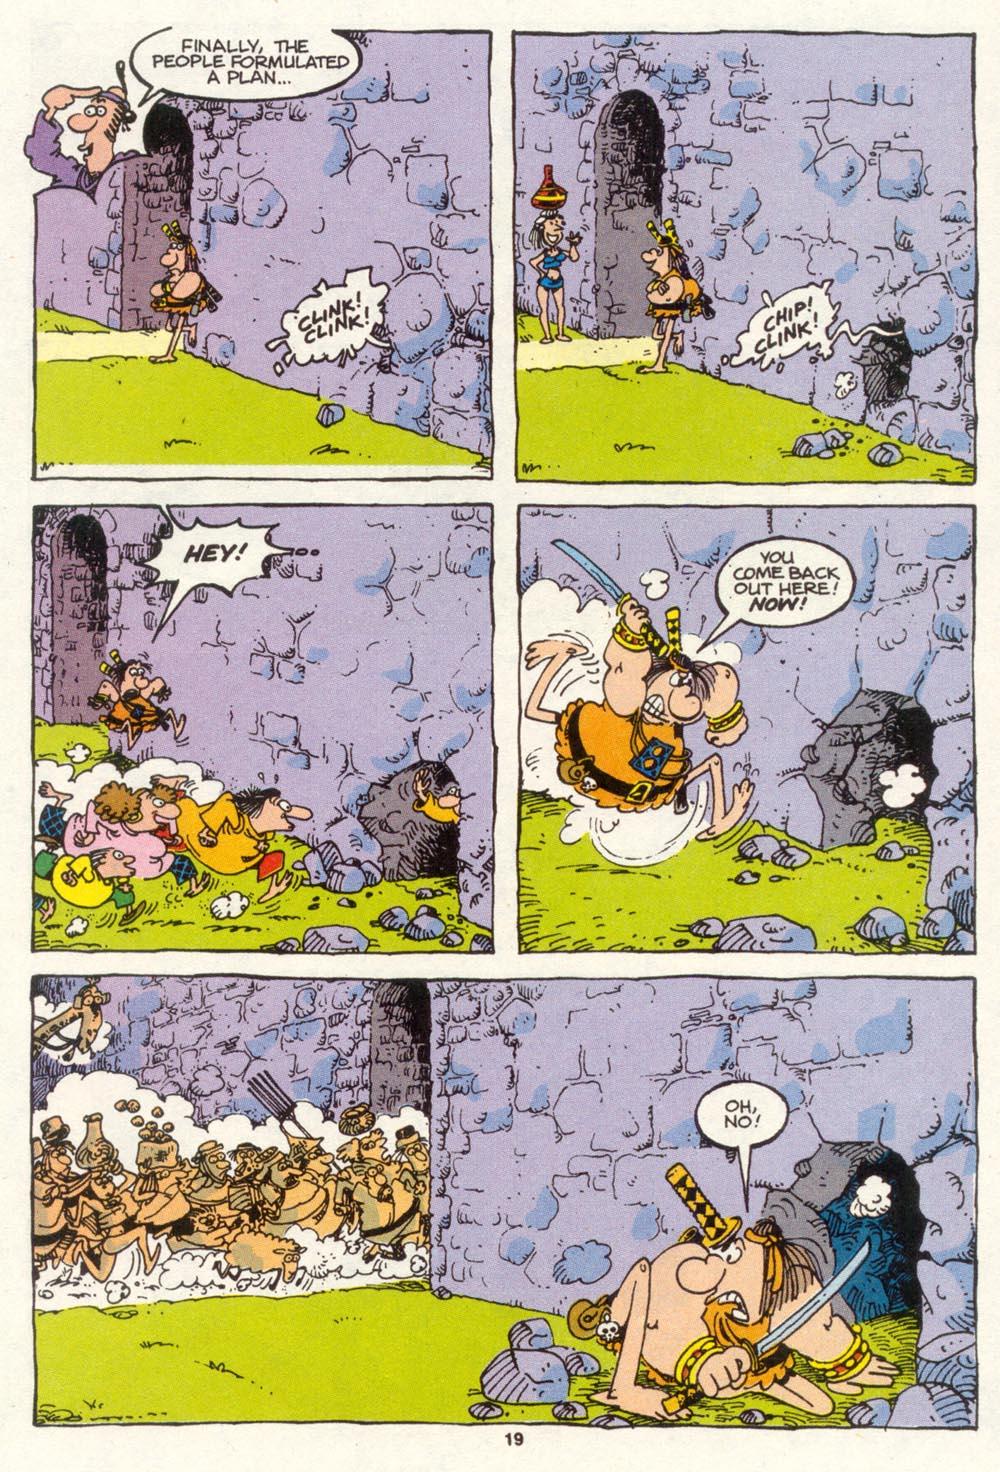 Read online Sergio Aragonés Groo the Wanderer comic -  Issue #86 - 15